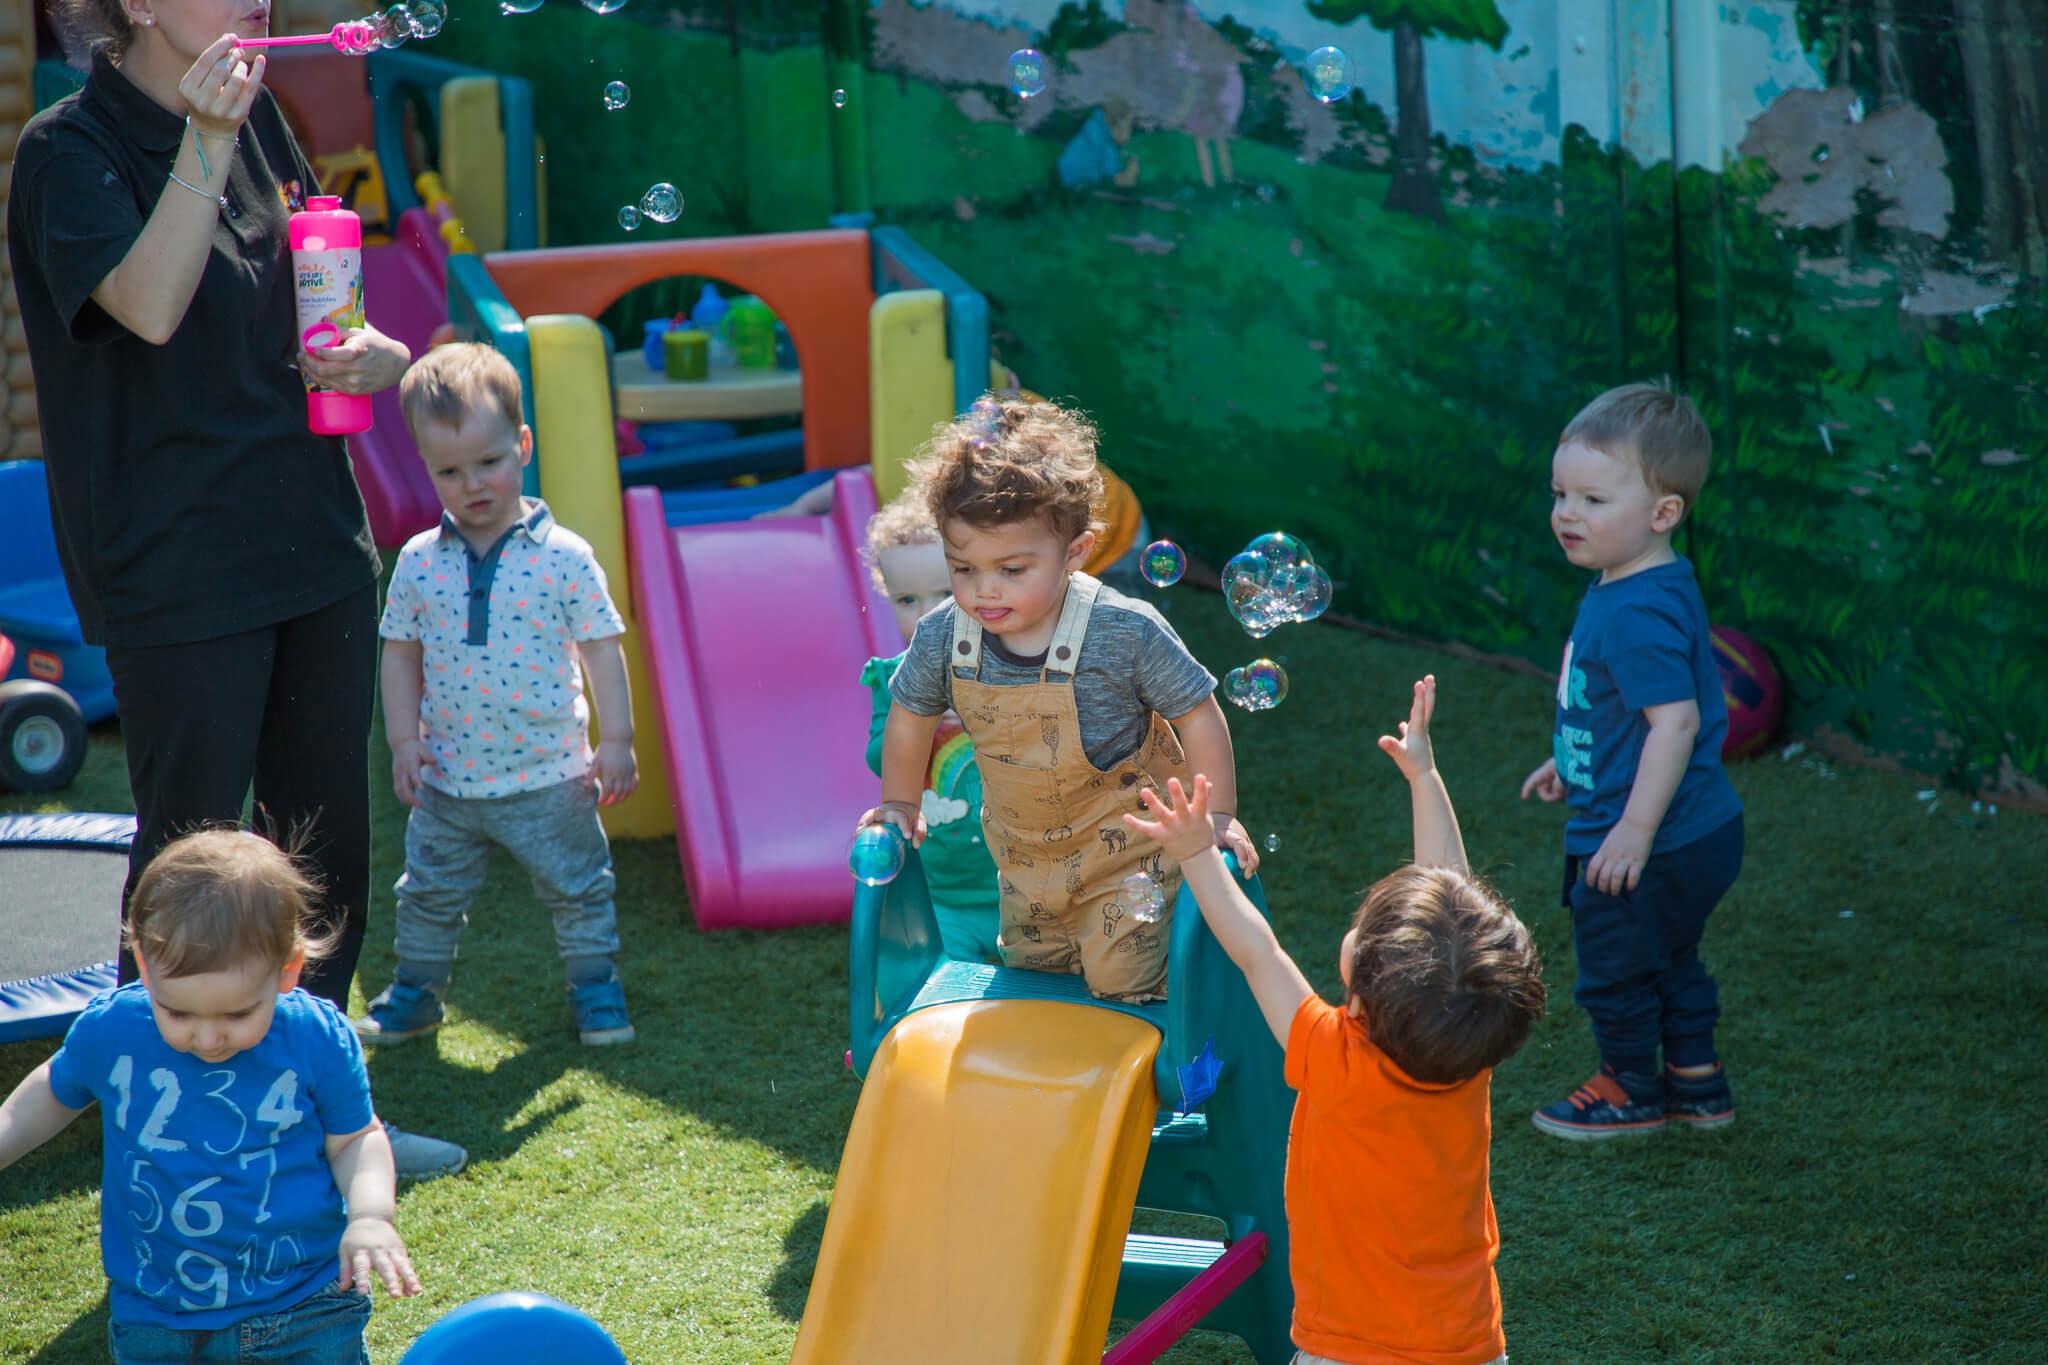 Children playing in playground.